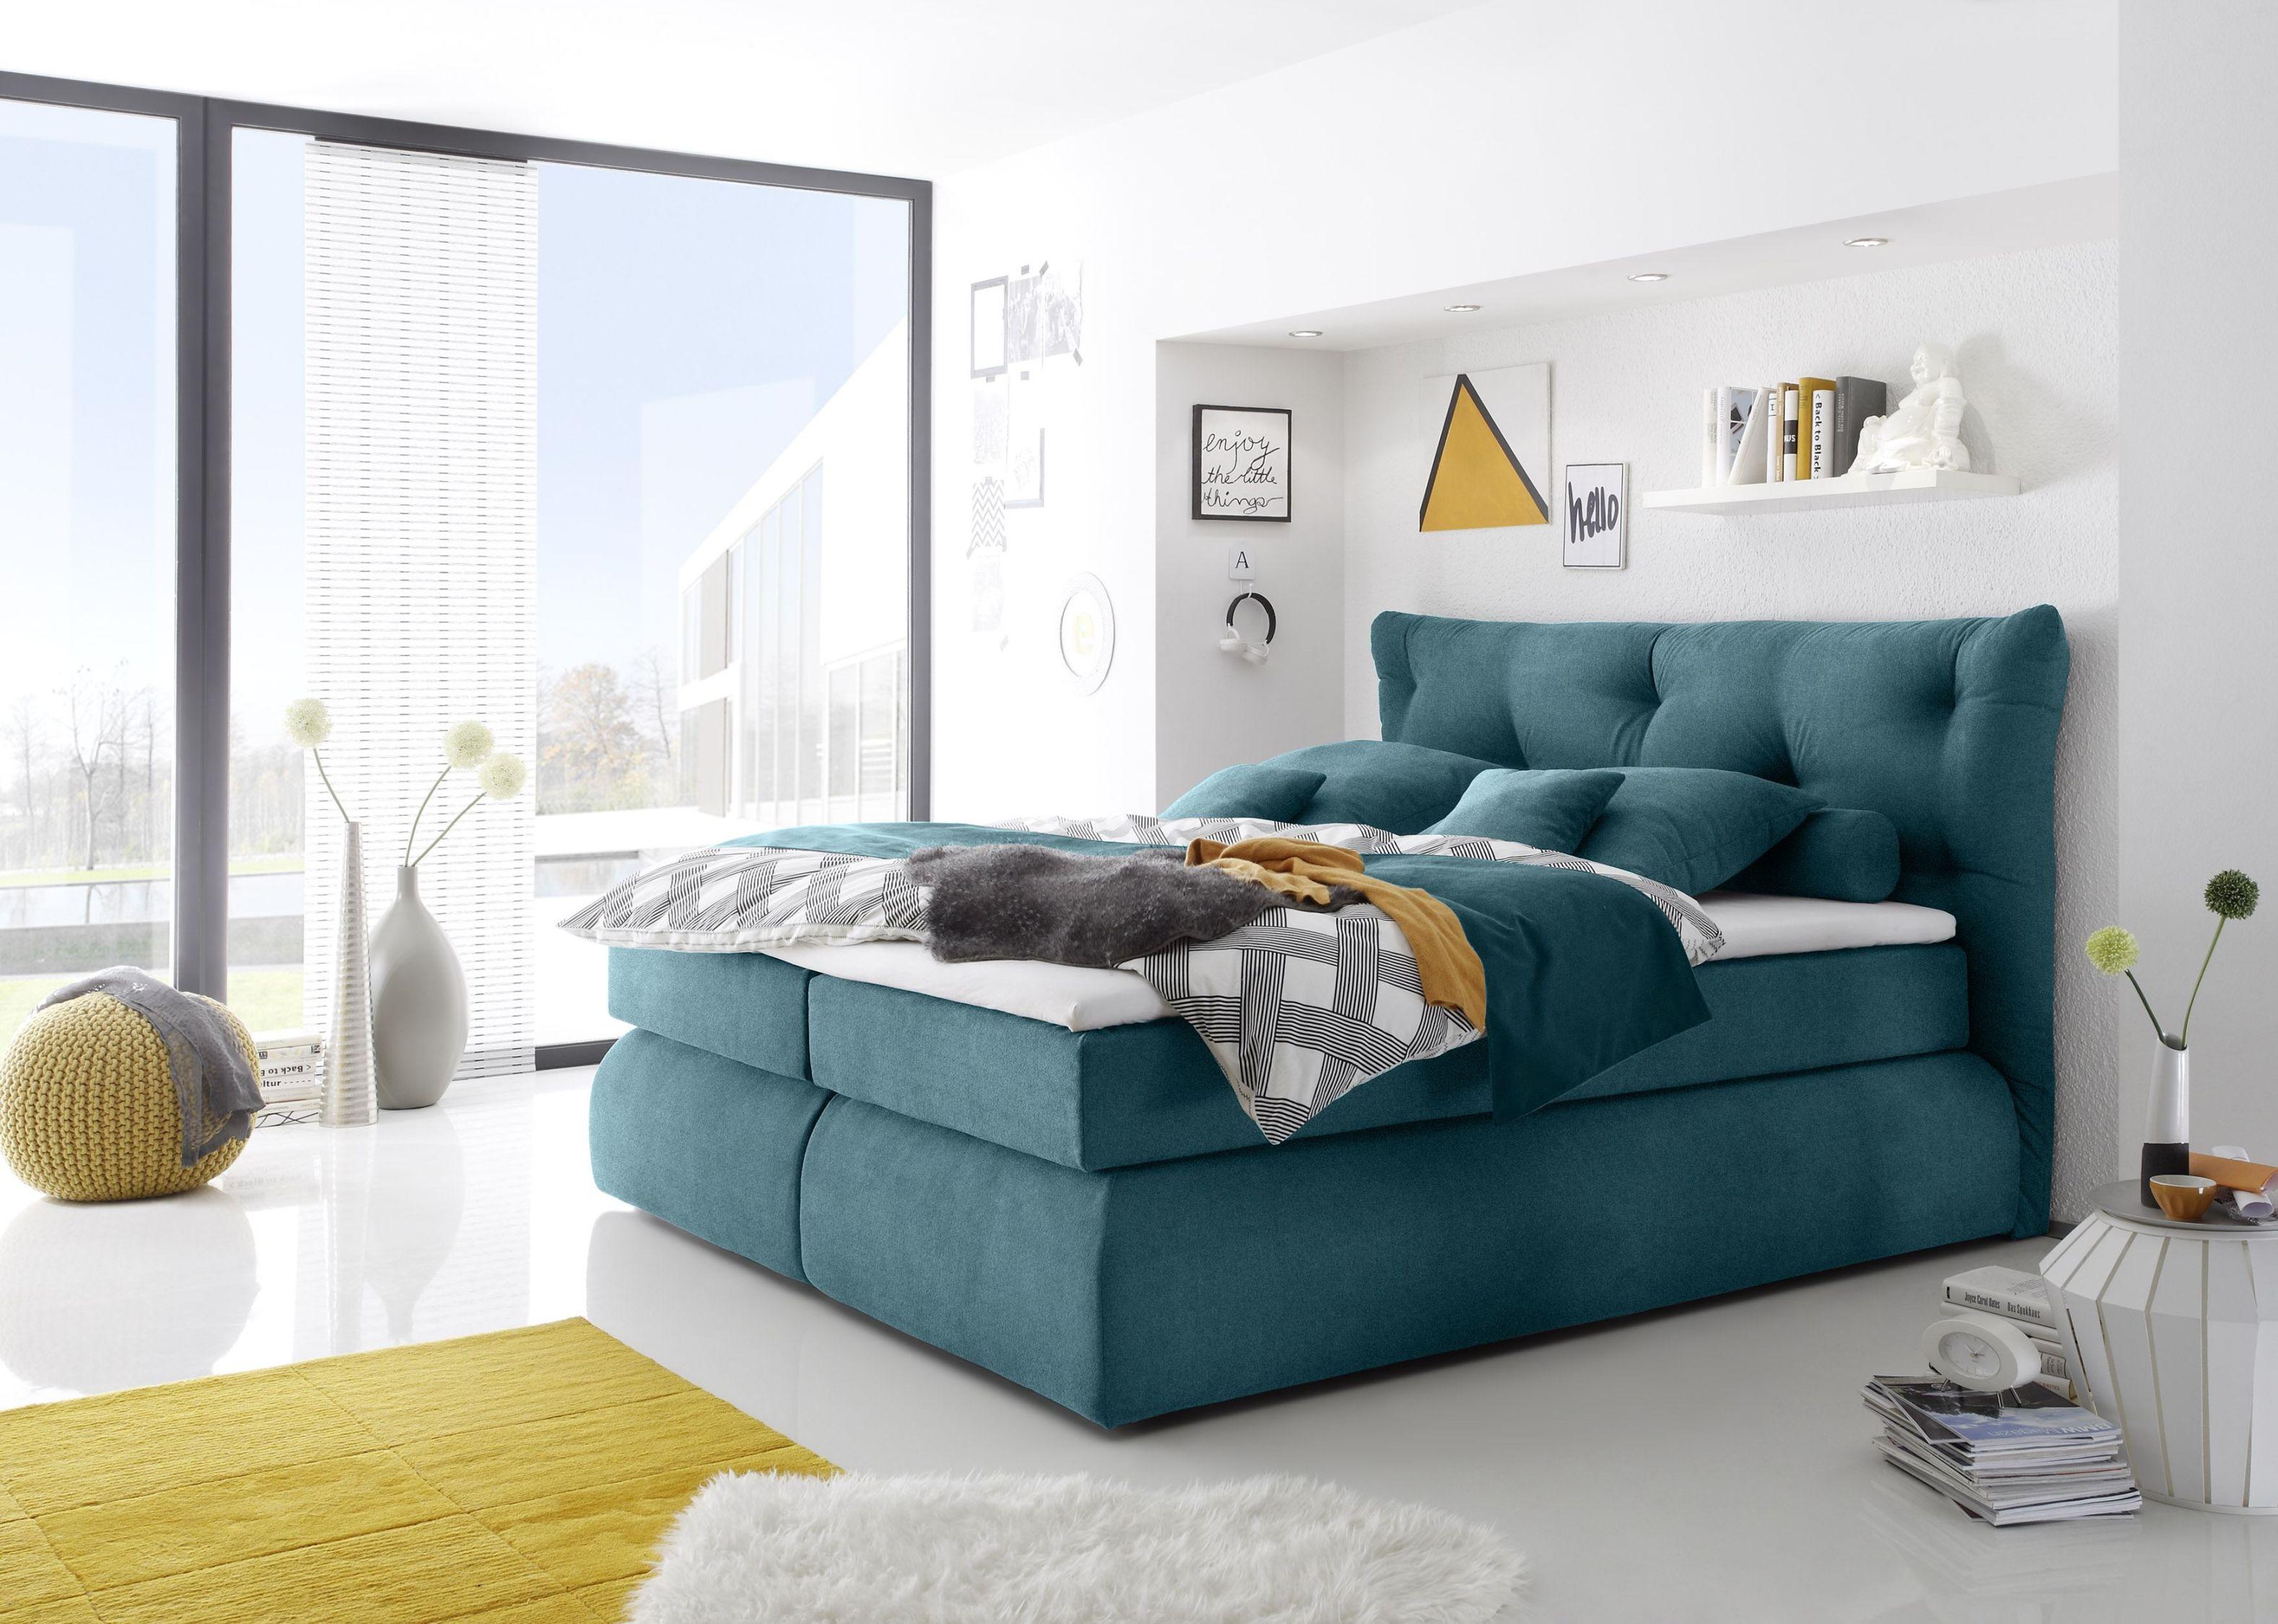 Details zu Boxspringbett 160cm blau Funktionspolsterbett Polsterbett  Schlafzimmer Bett Ma3